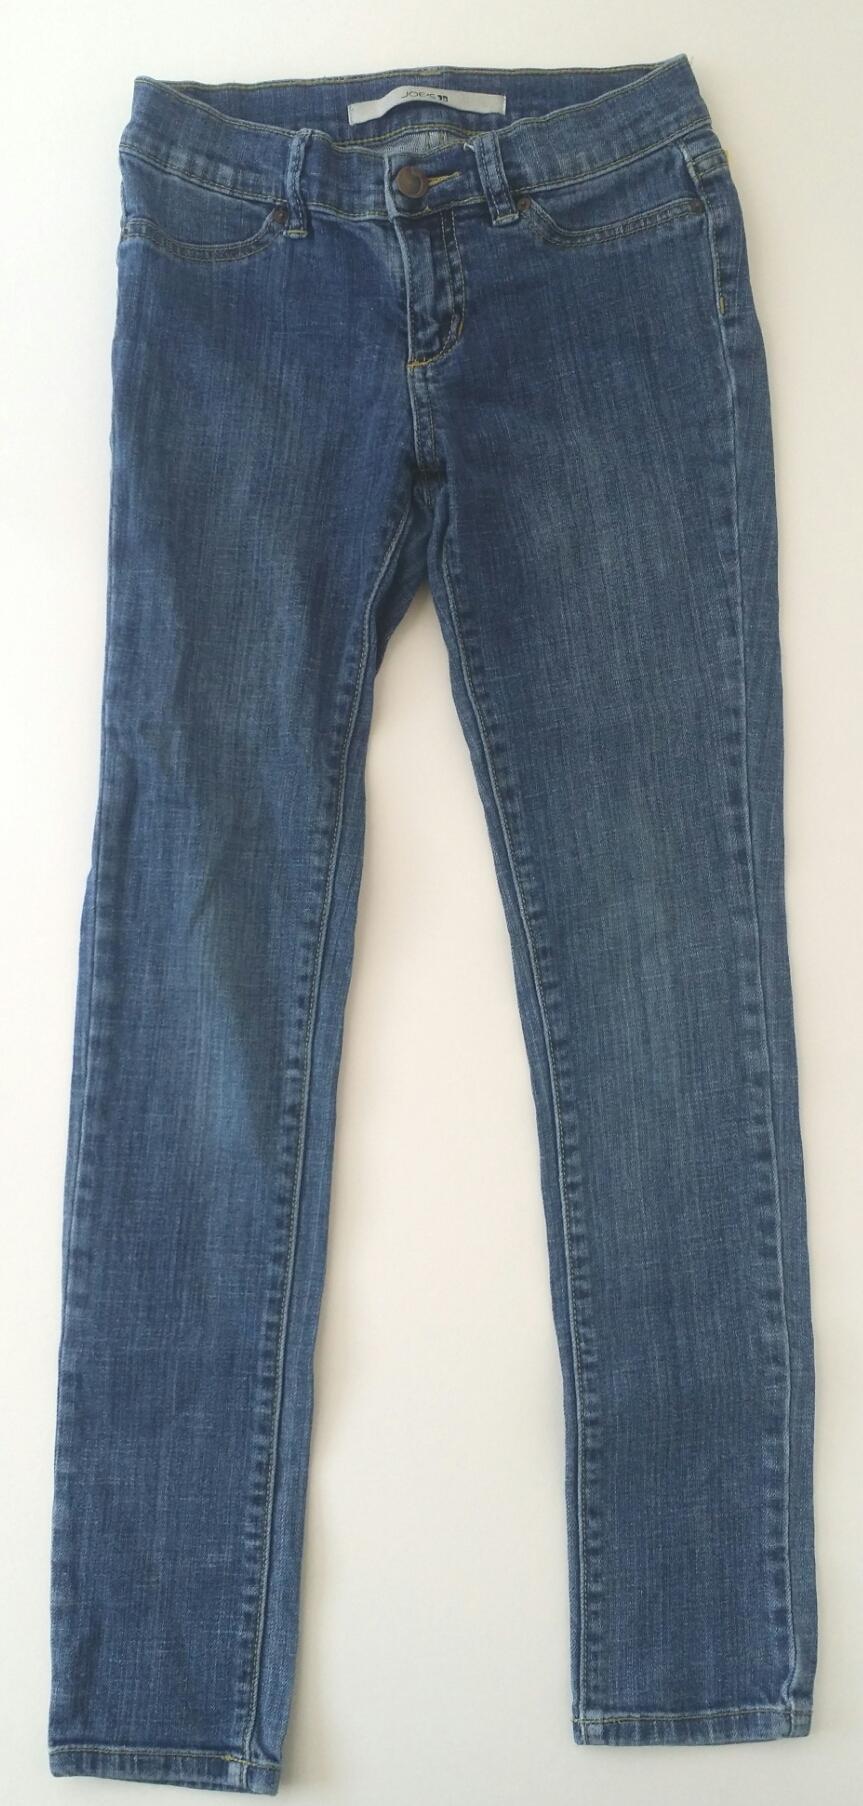 JOES-12-YEARS-Jeans_2138862A.jpg